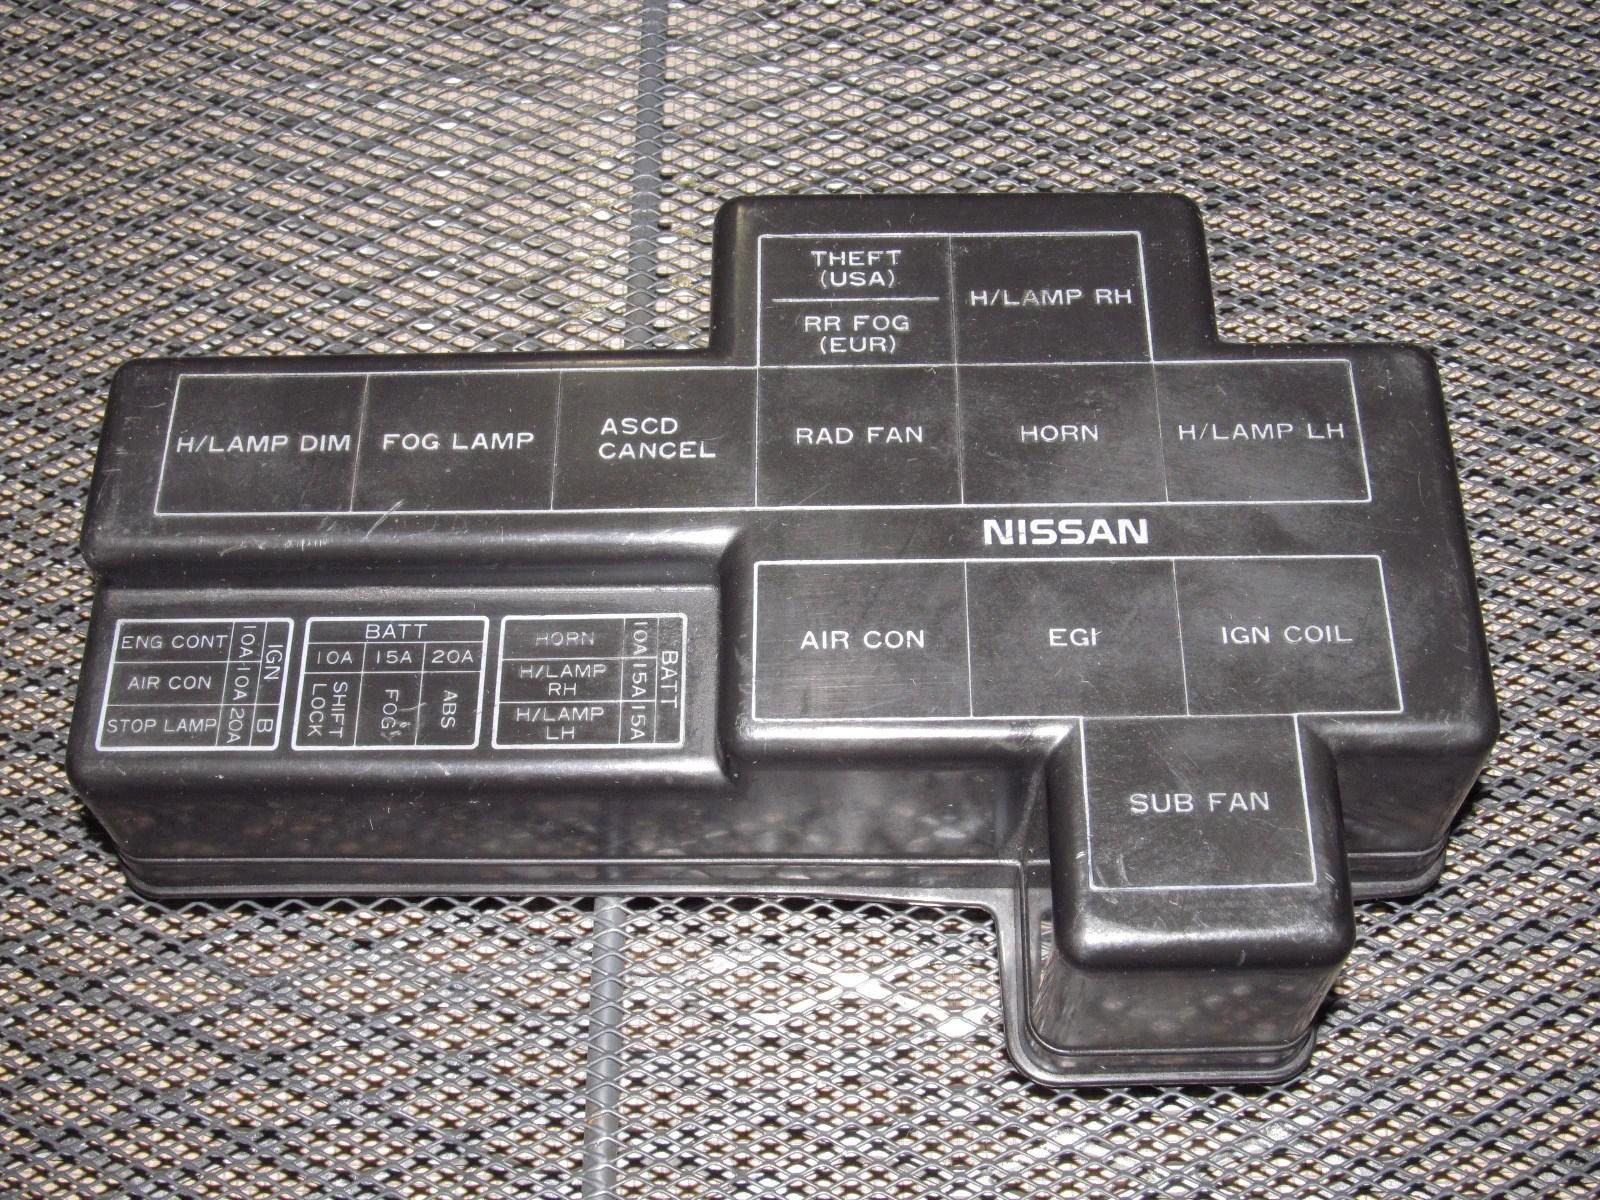 medium resolution of z32 fuse box wiring diagram 300zx fuse box translation 300zx fuse box